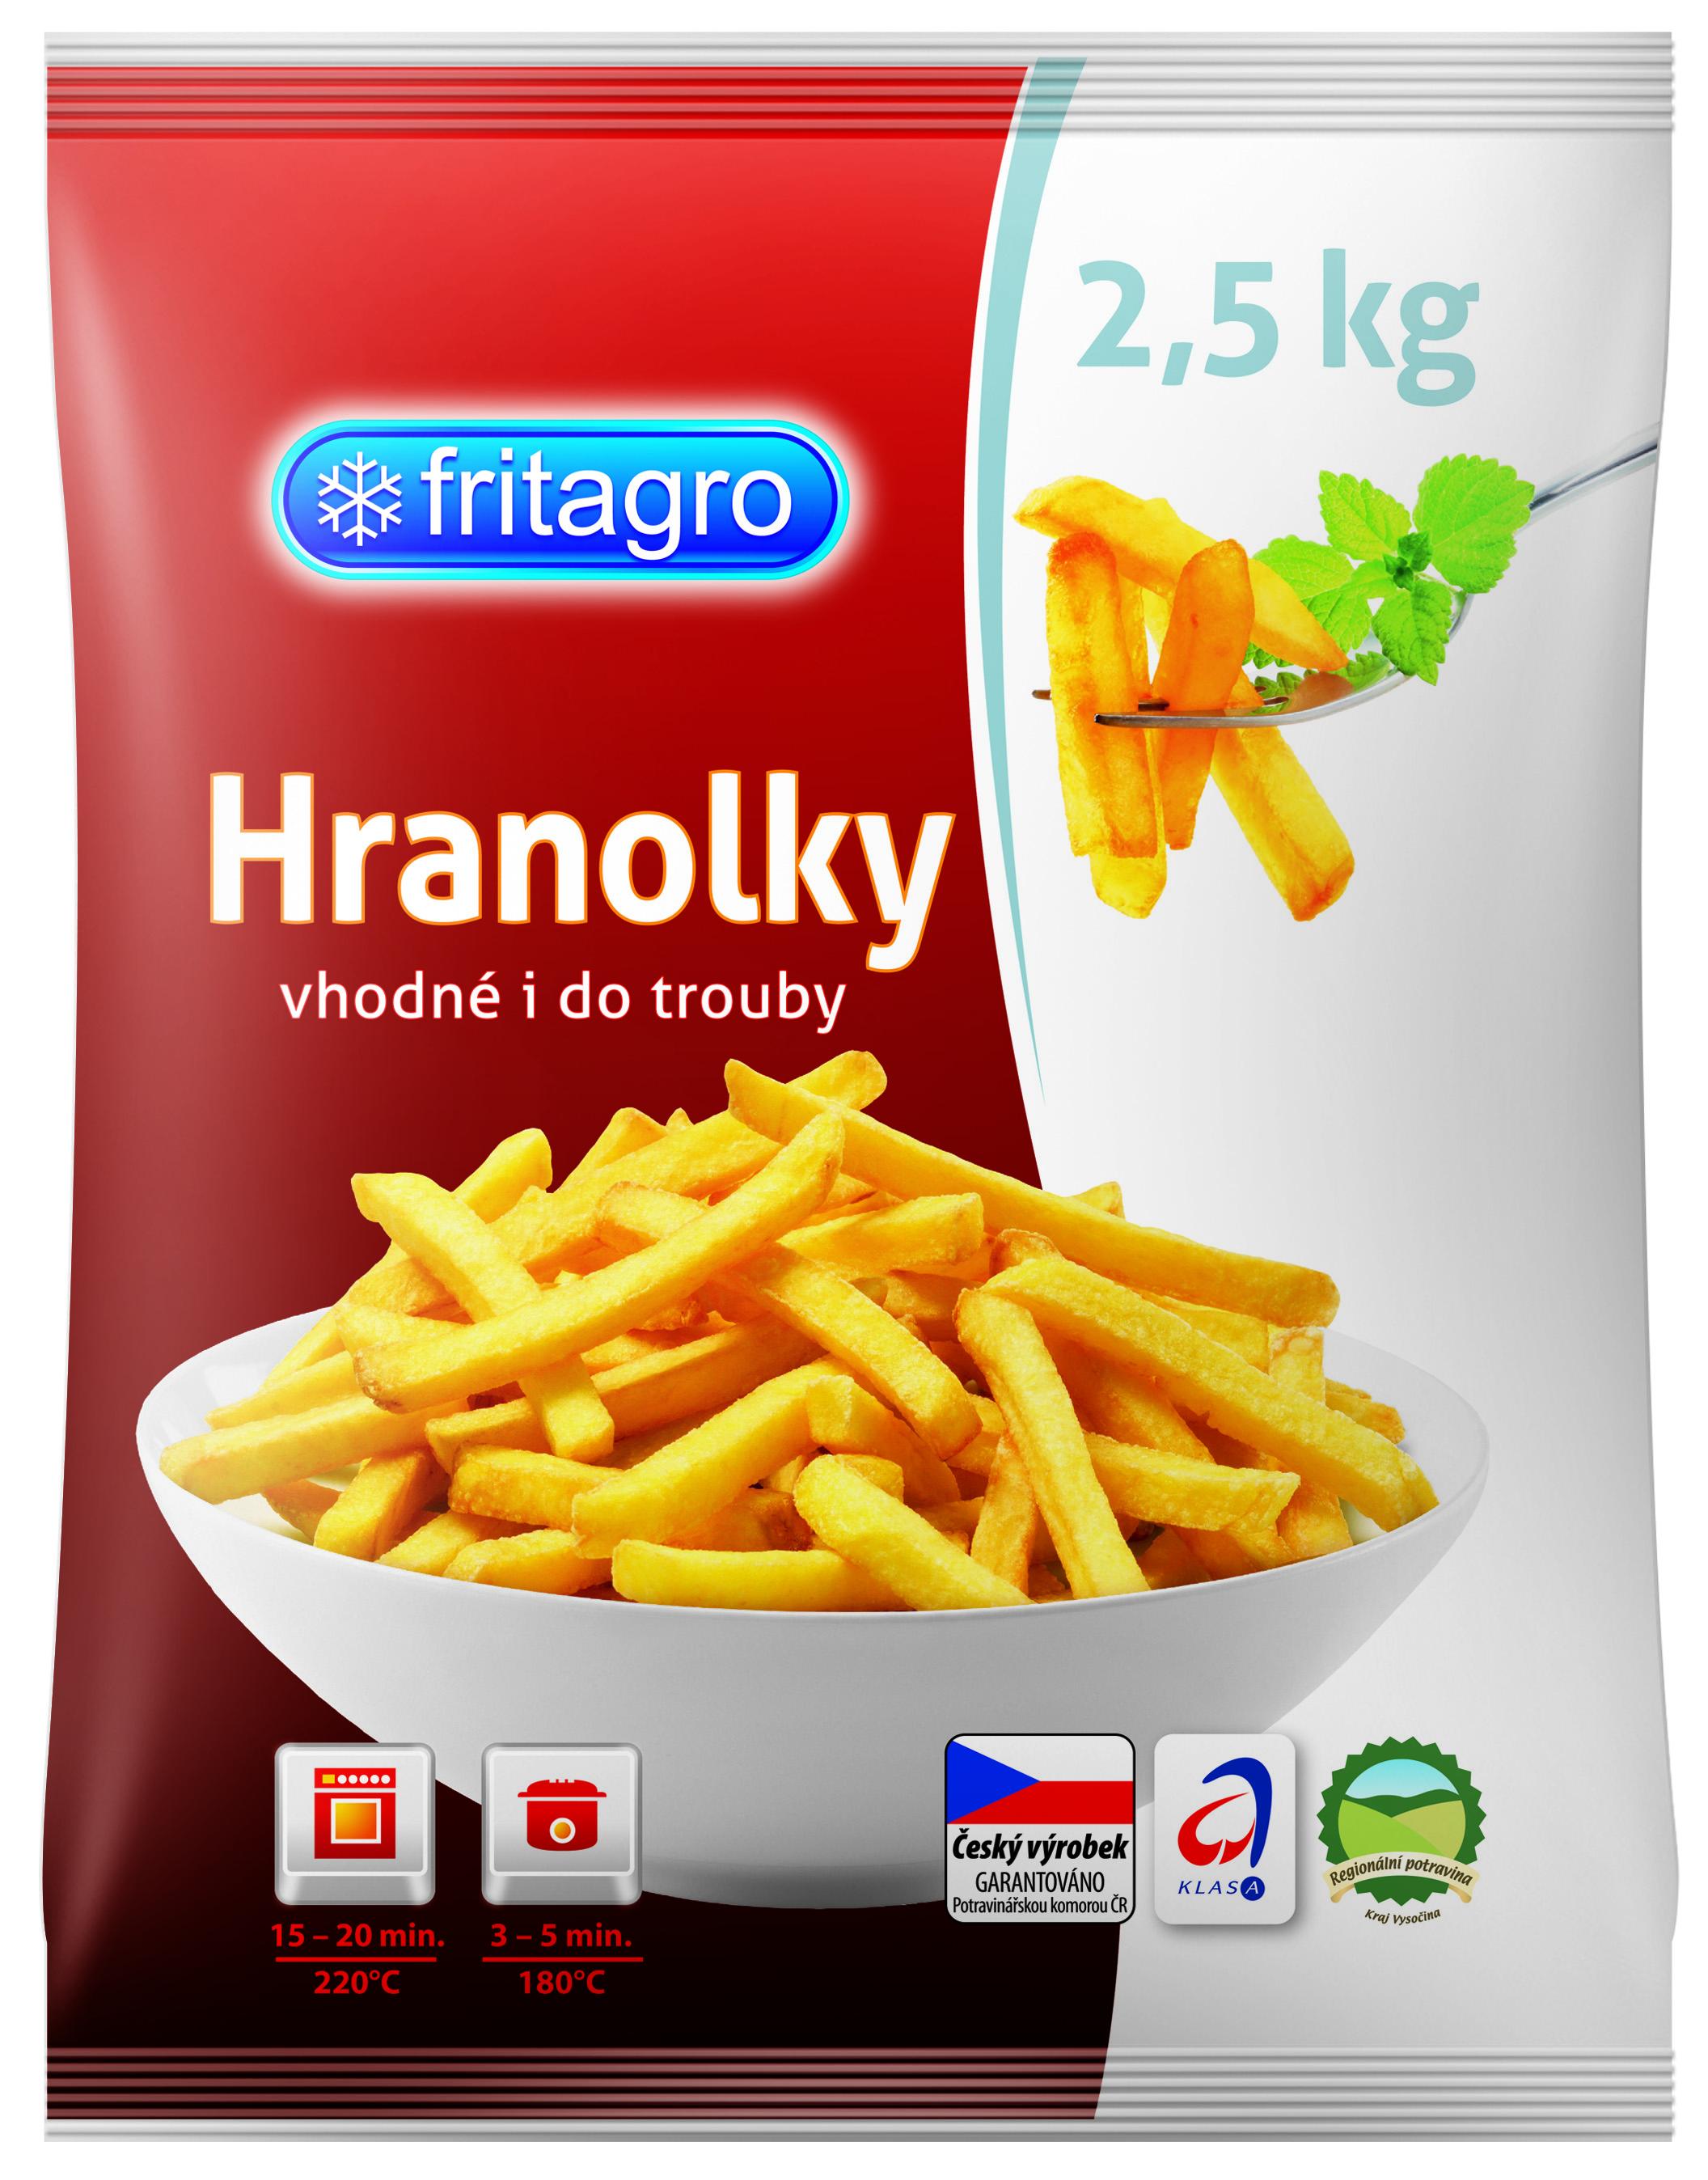 Značka FRITAGRO hranolky 2,5kg